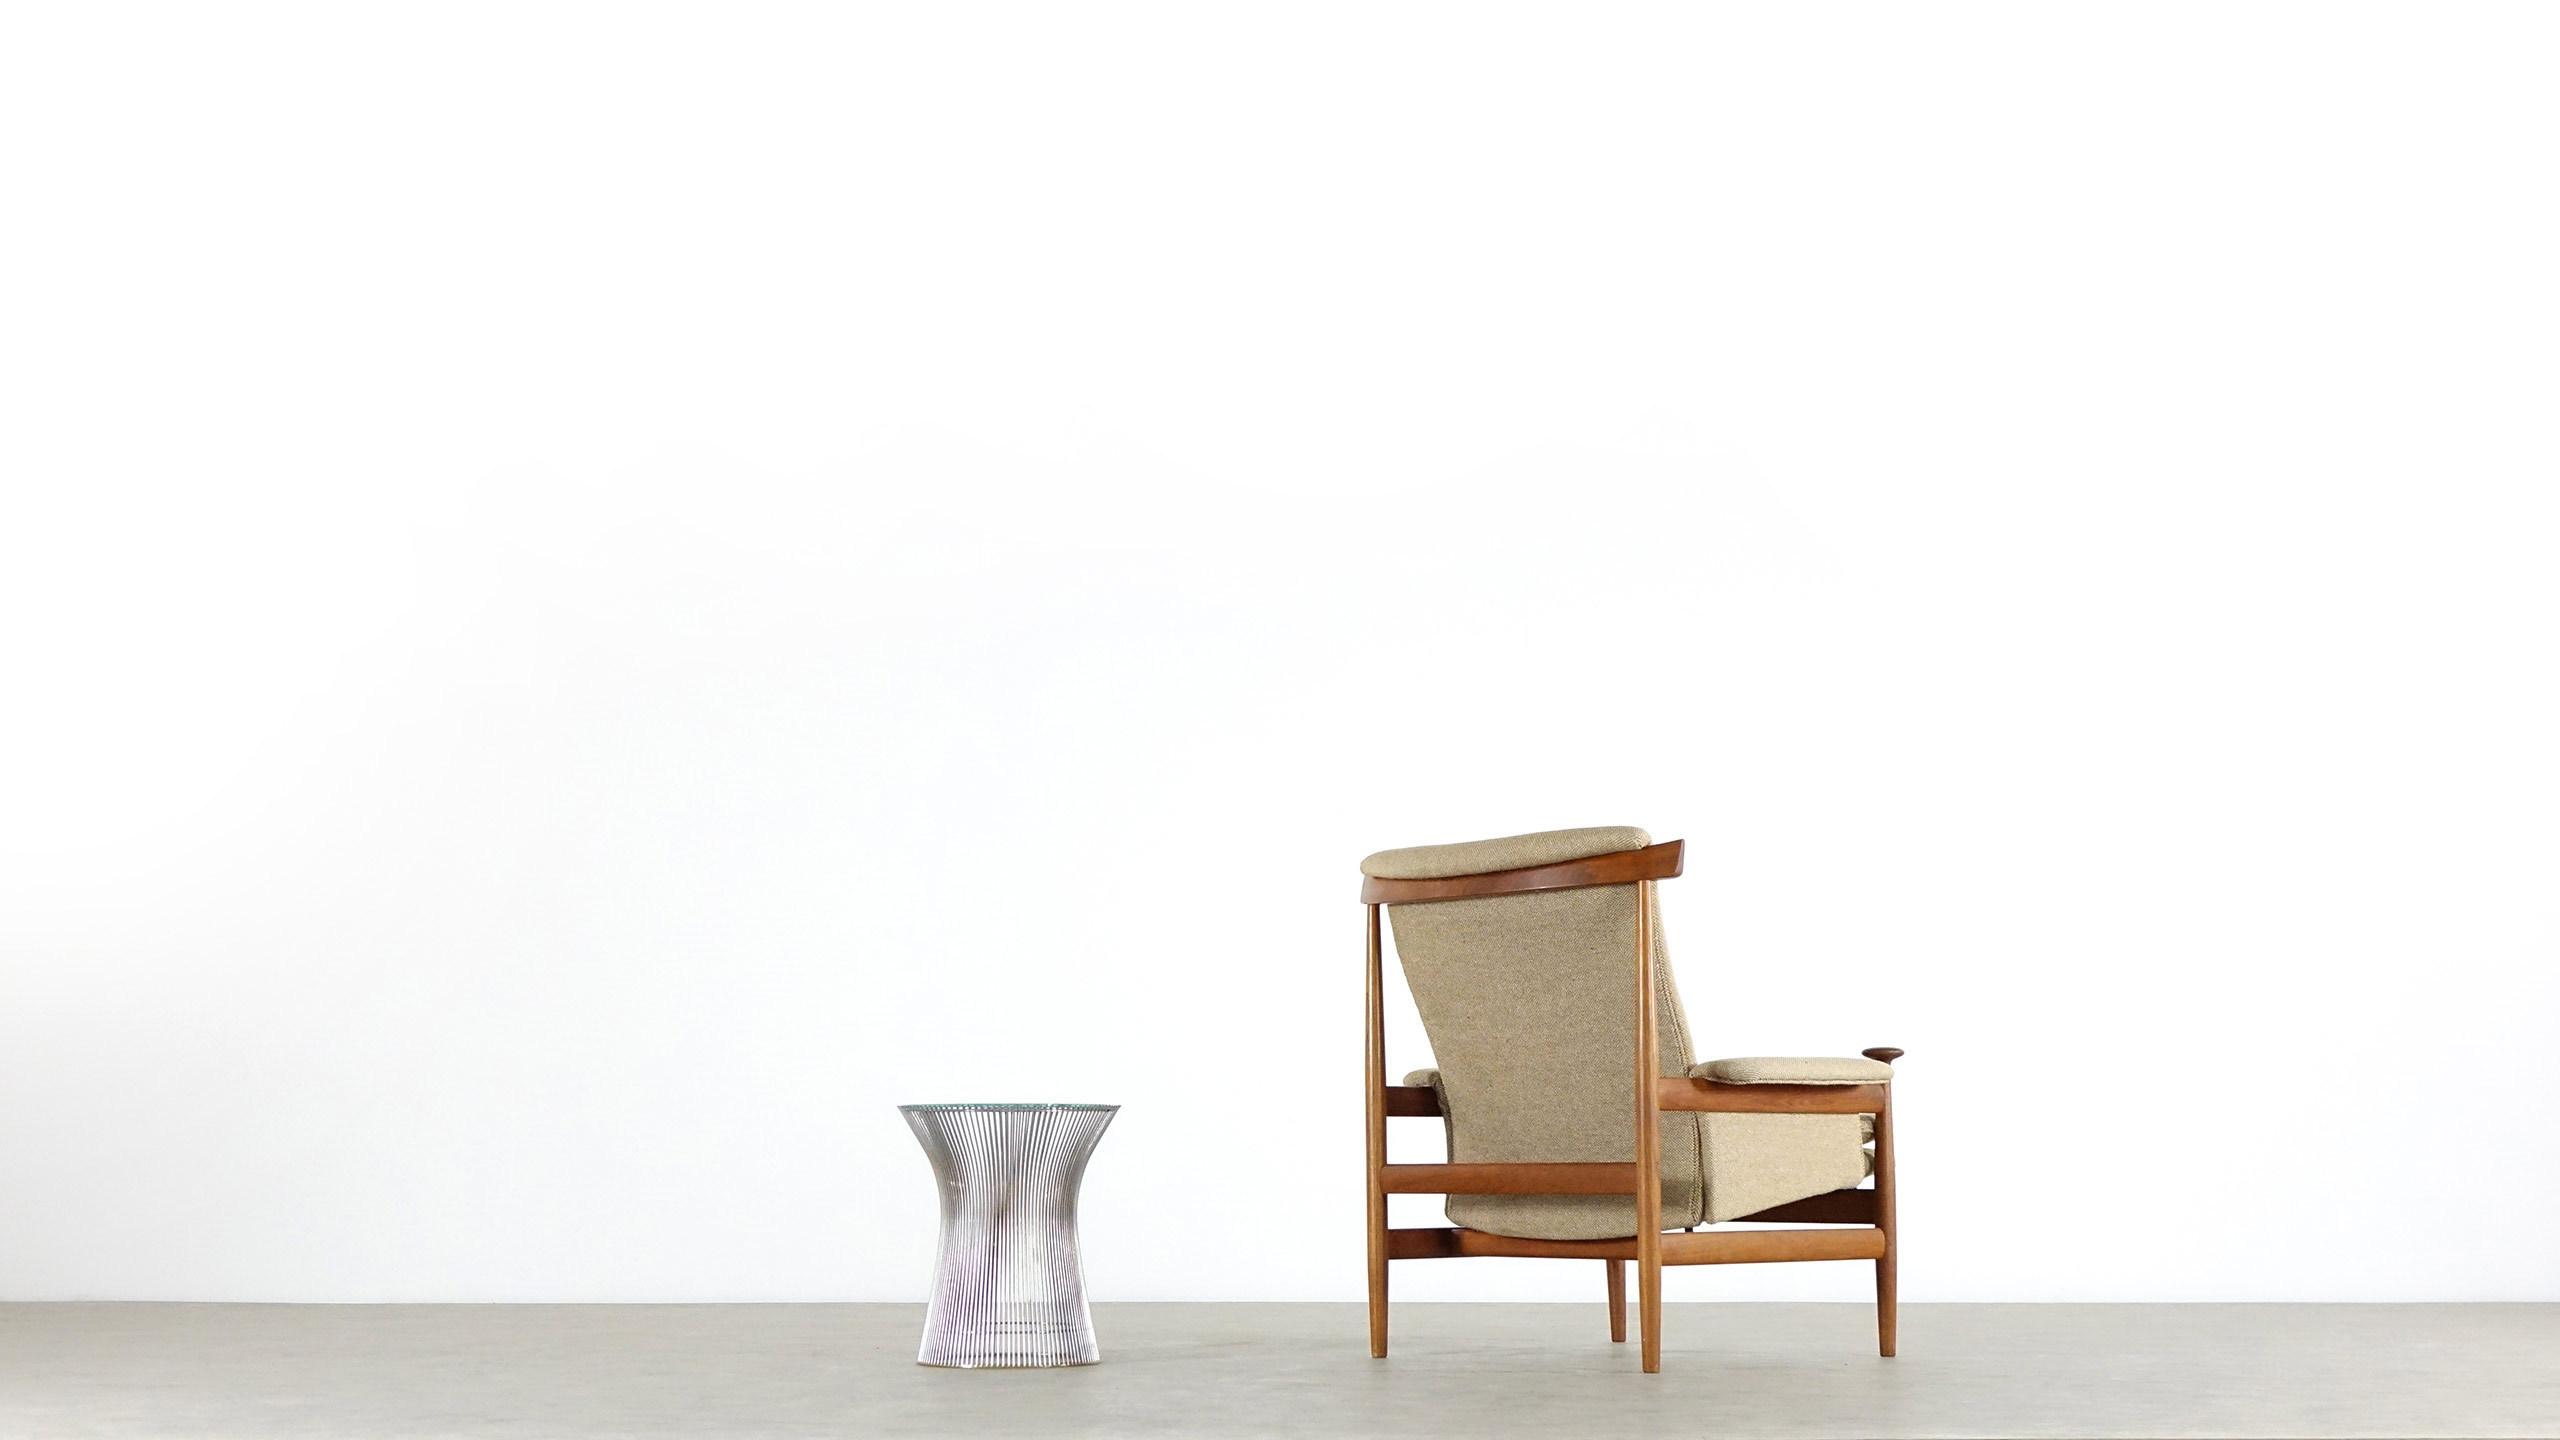 bwana teak lounge chair by finn juhl for france son